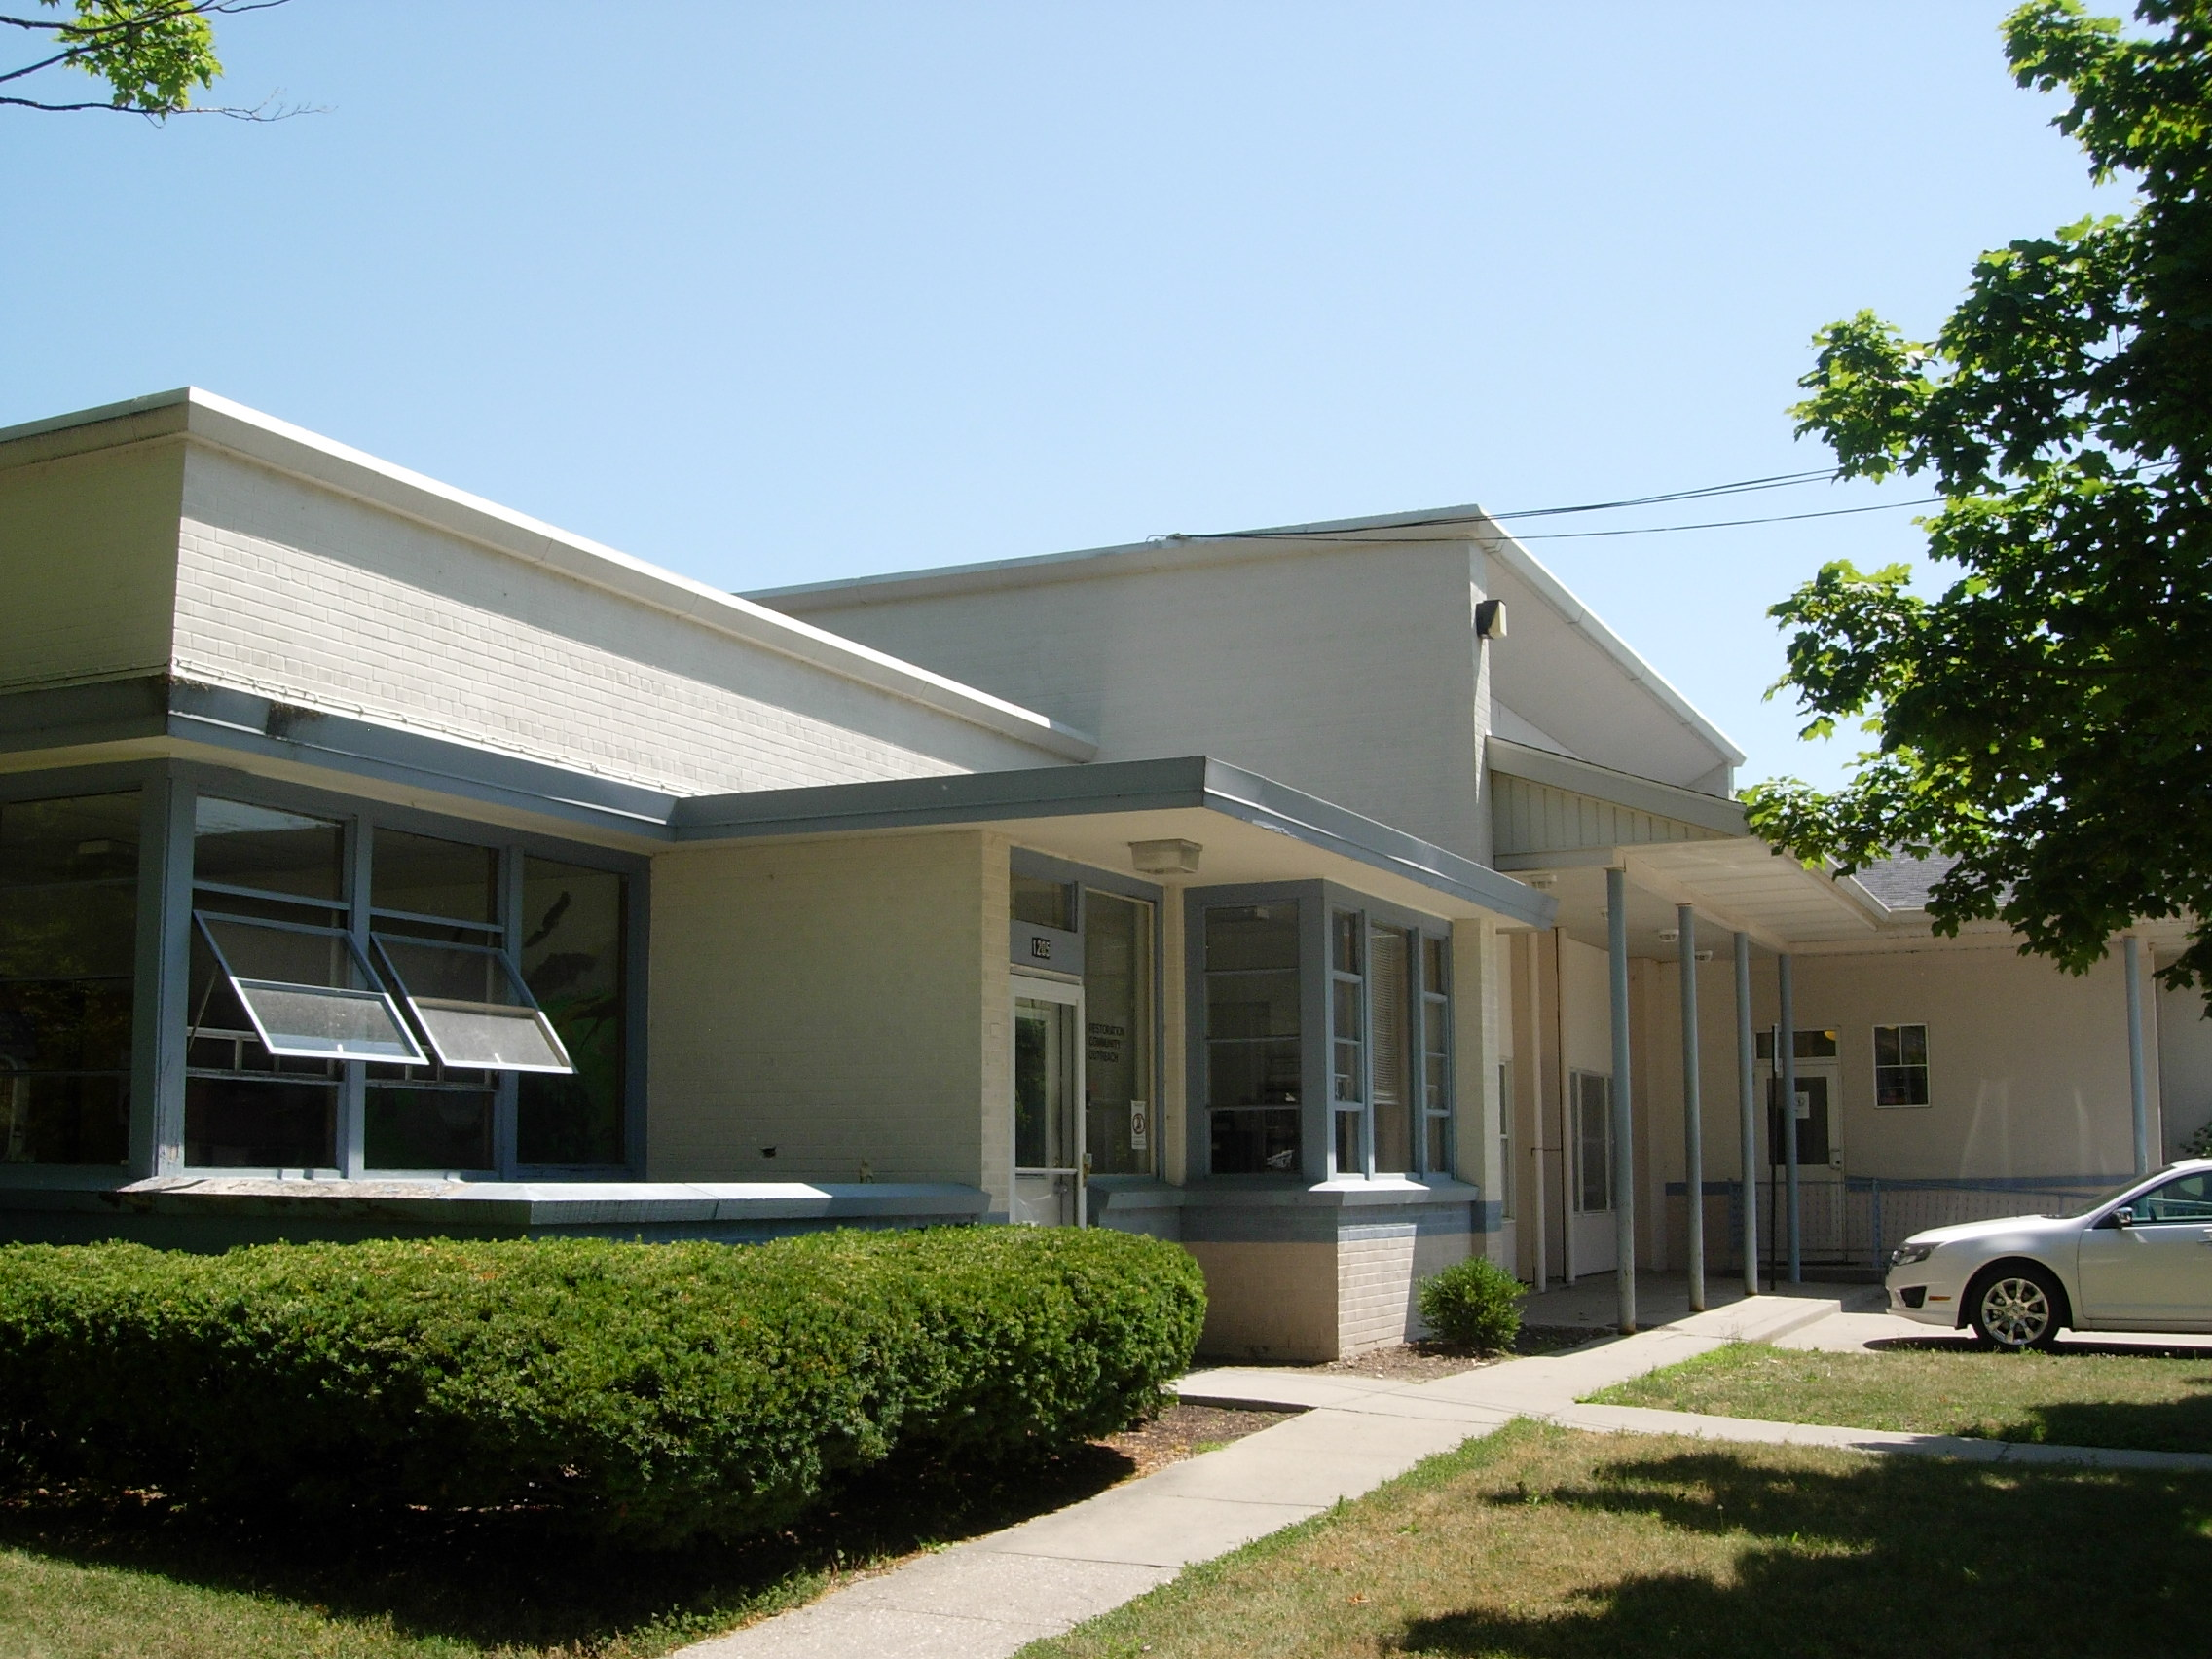 Restoration Community Outreach shelter